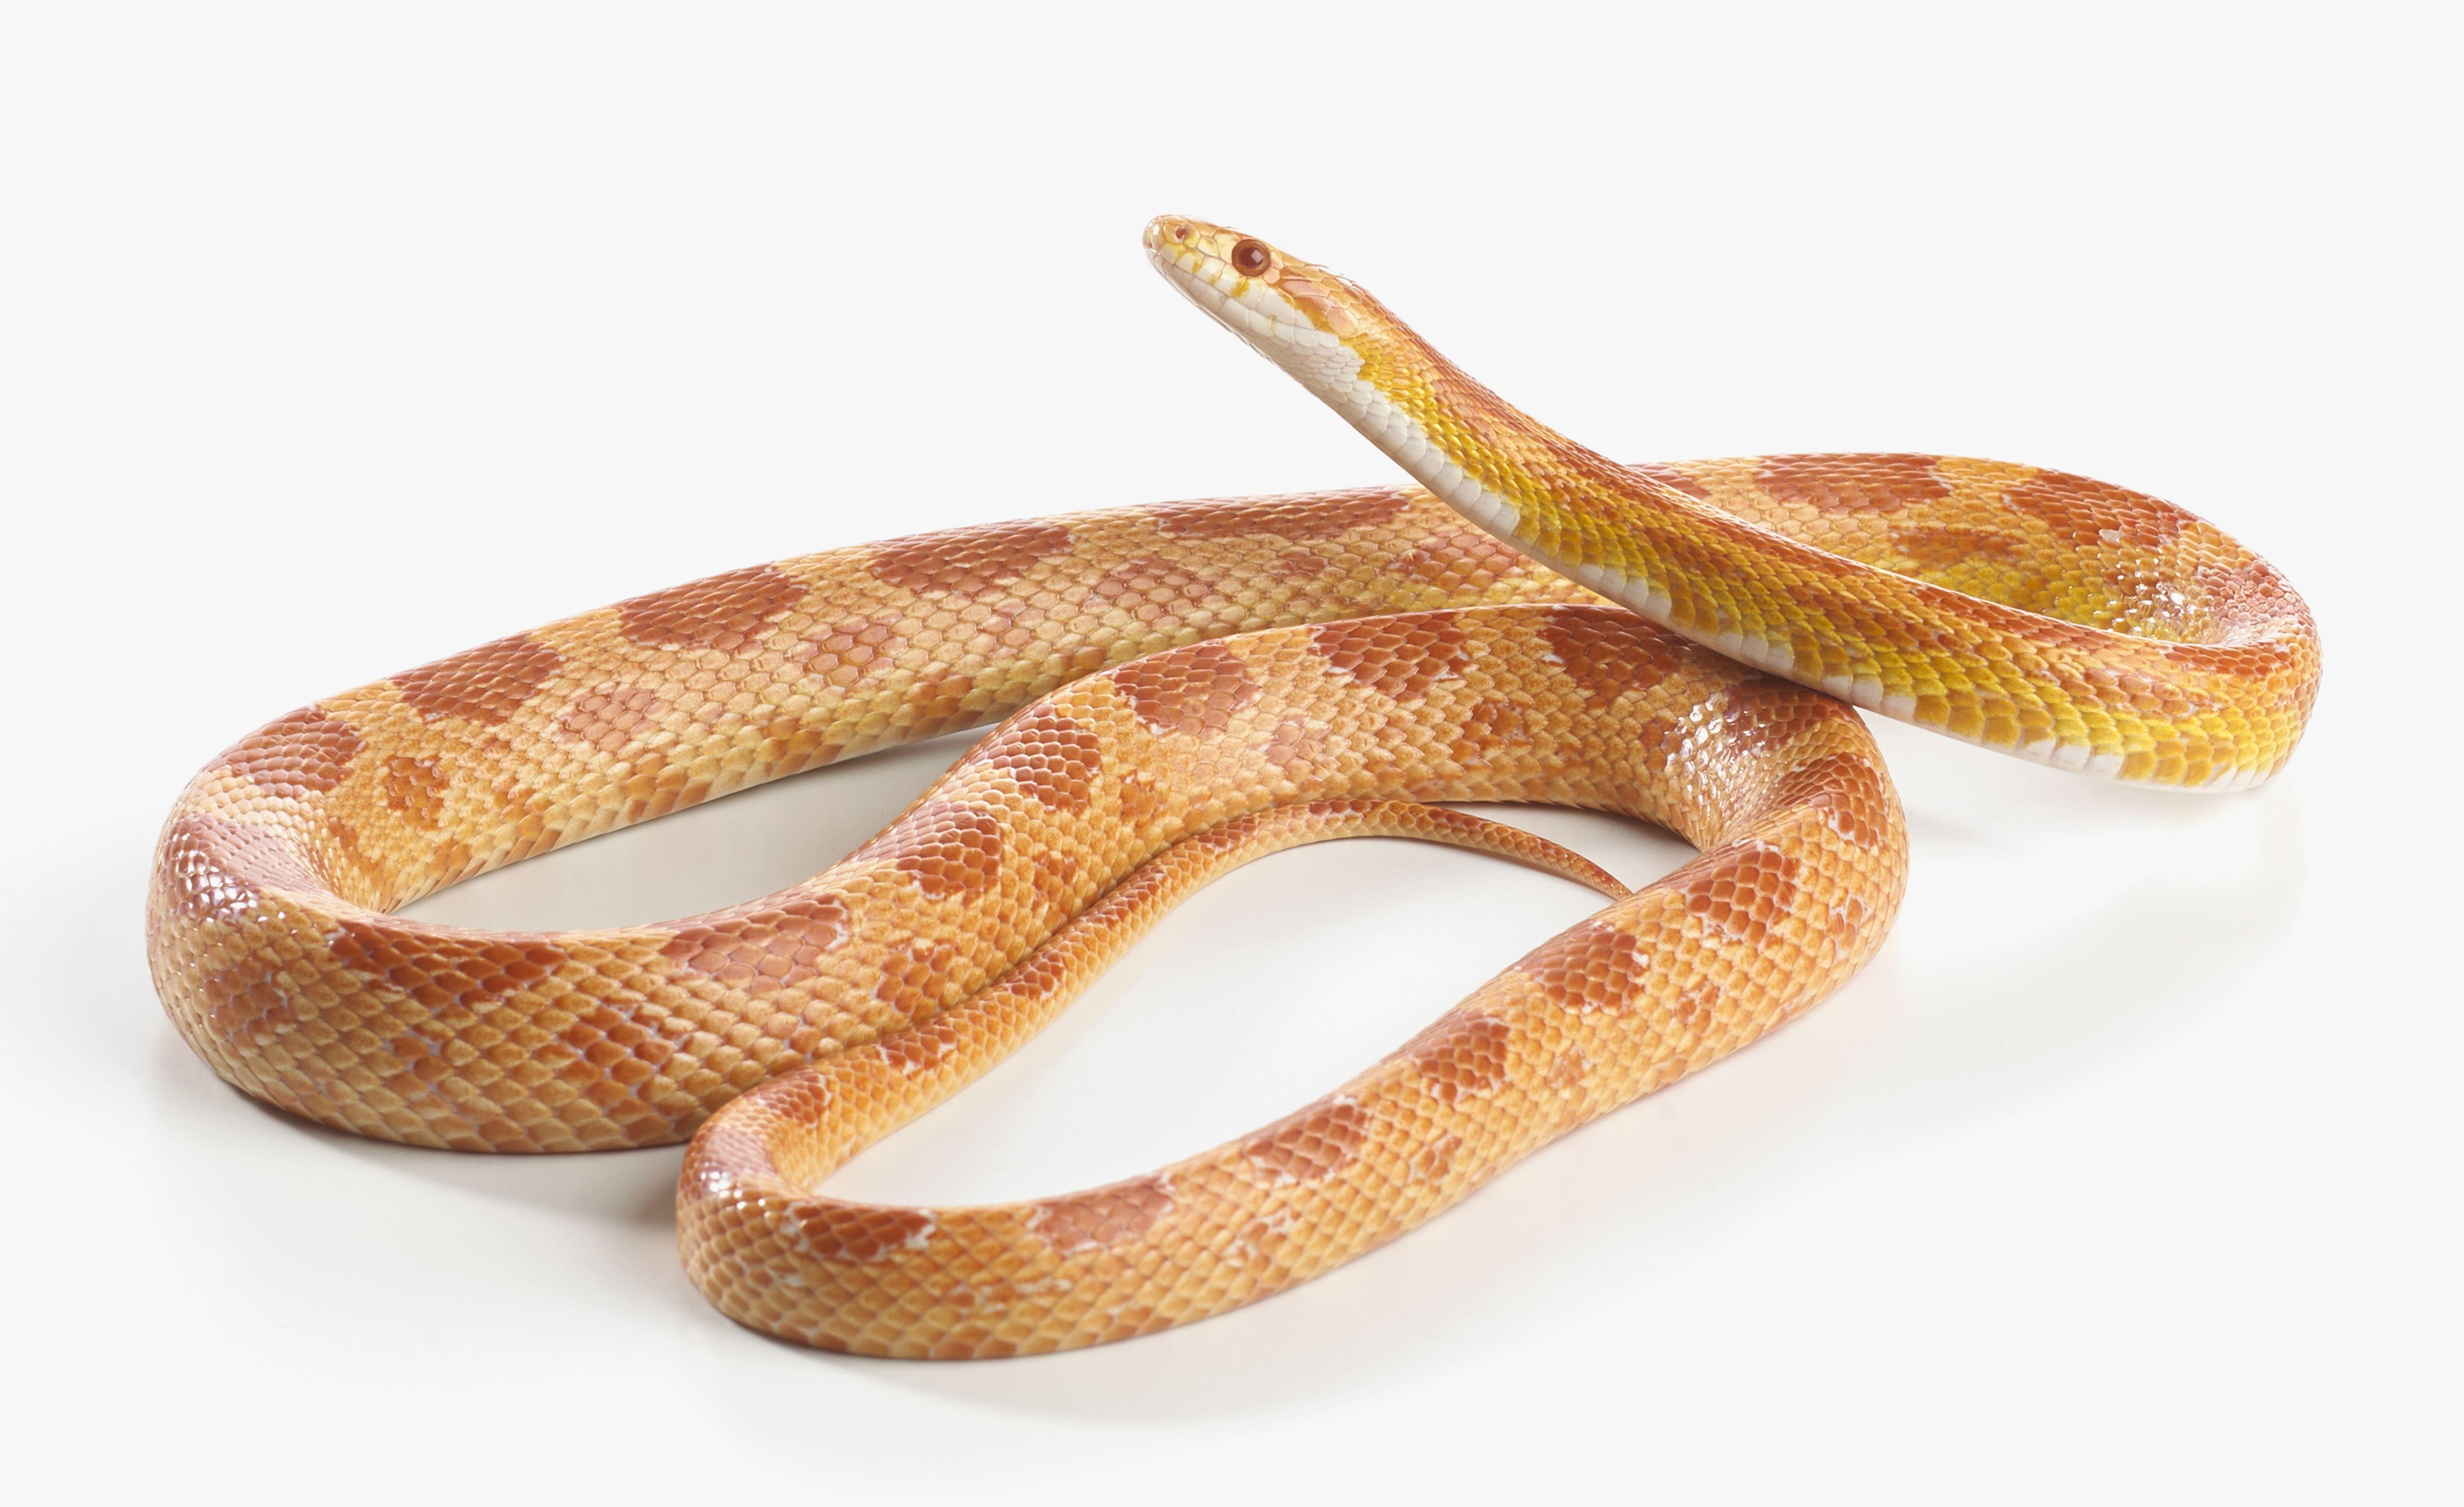 Serpiente de maíz Sunglow, Serpiente de maíz Sunglow (Pantherophis guttatus)